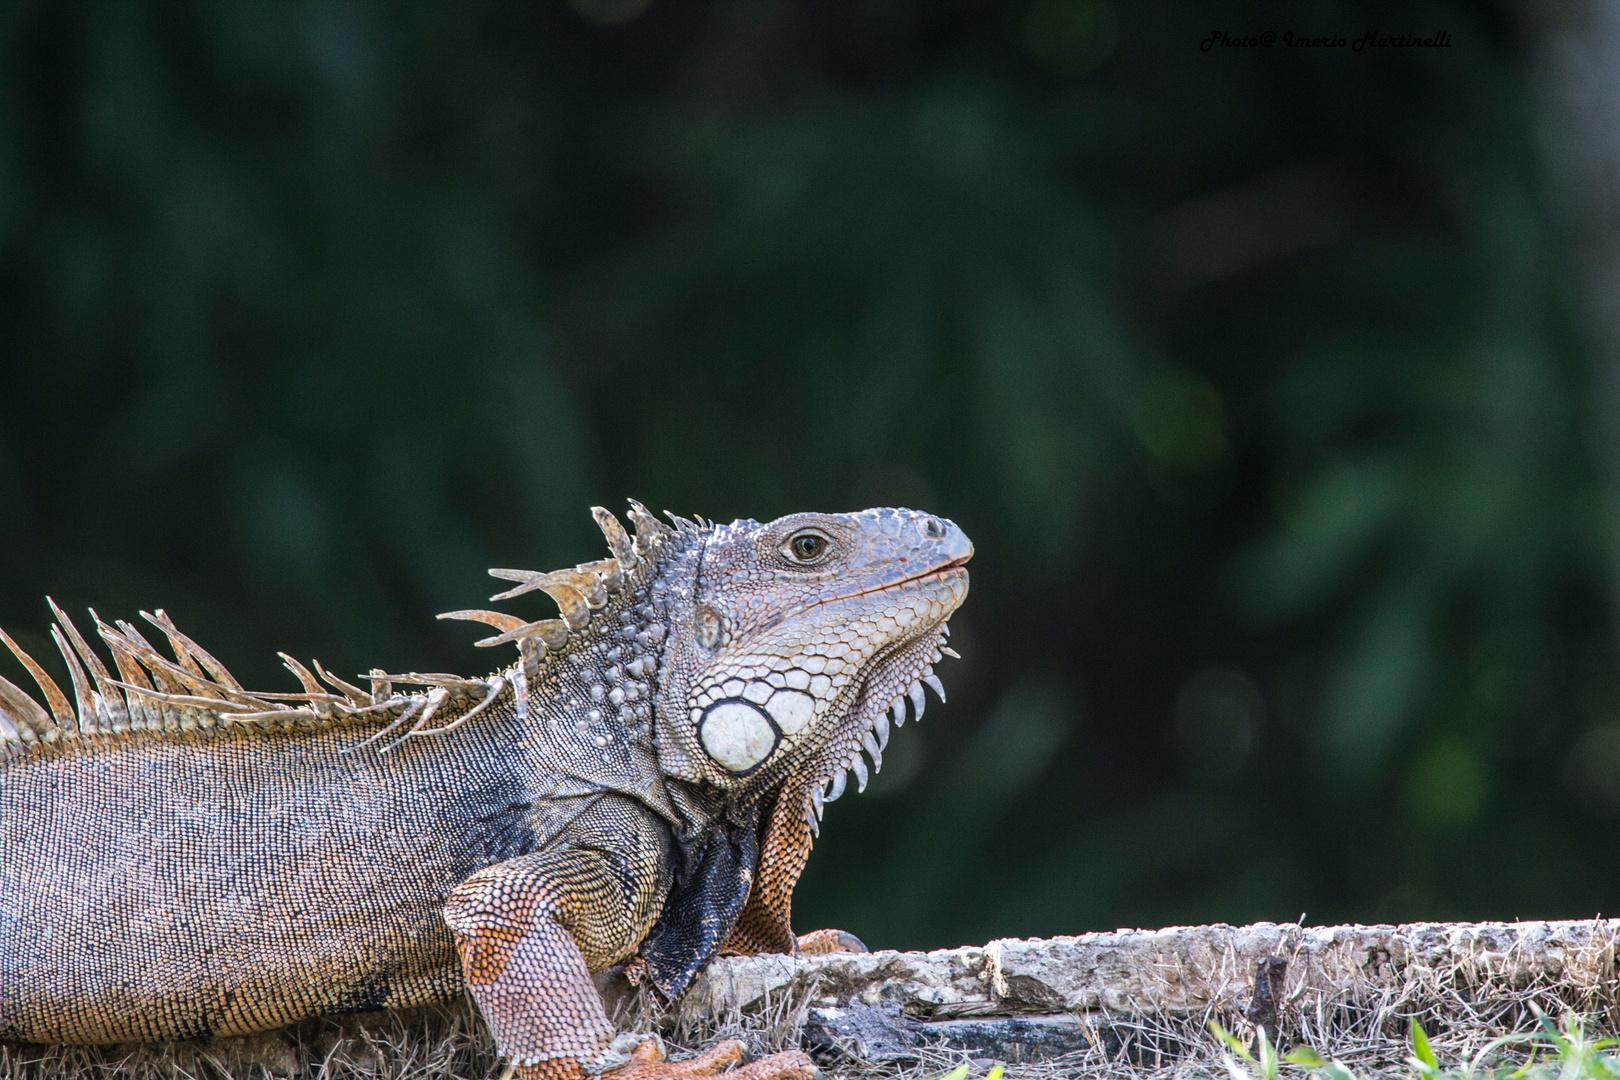 Iguana in the park